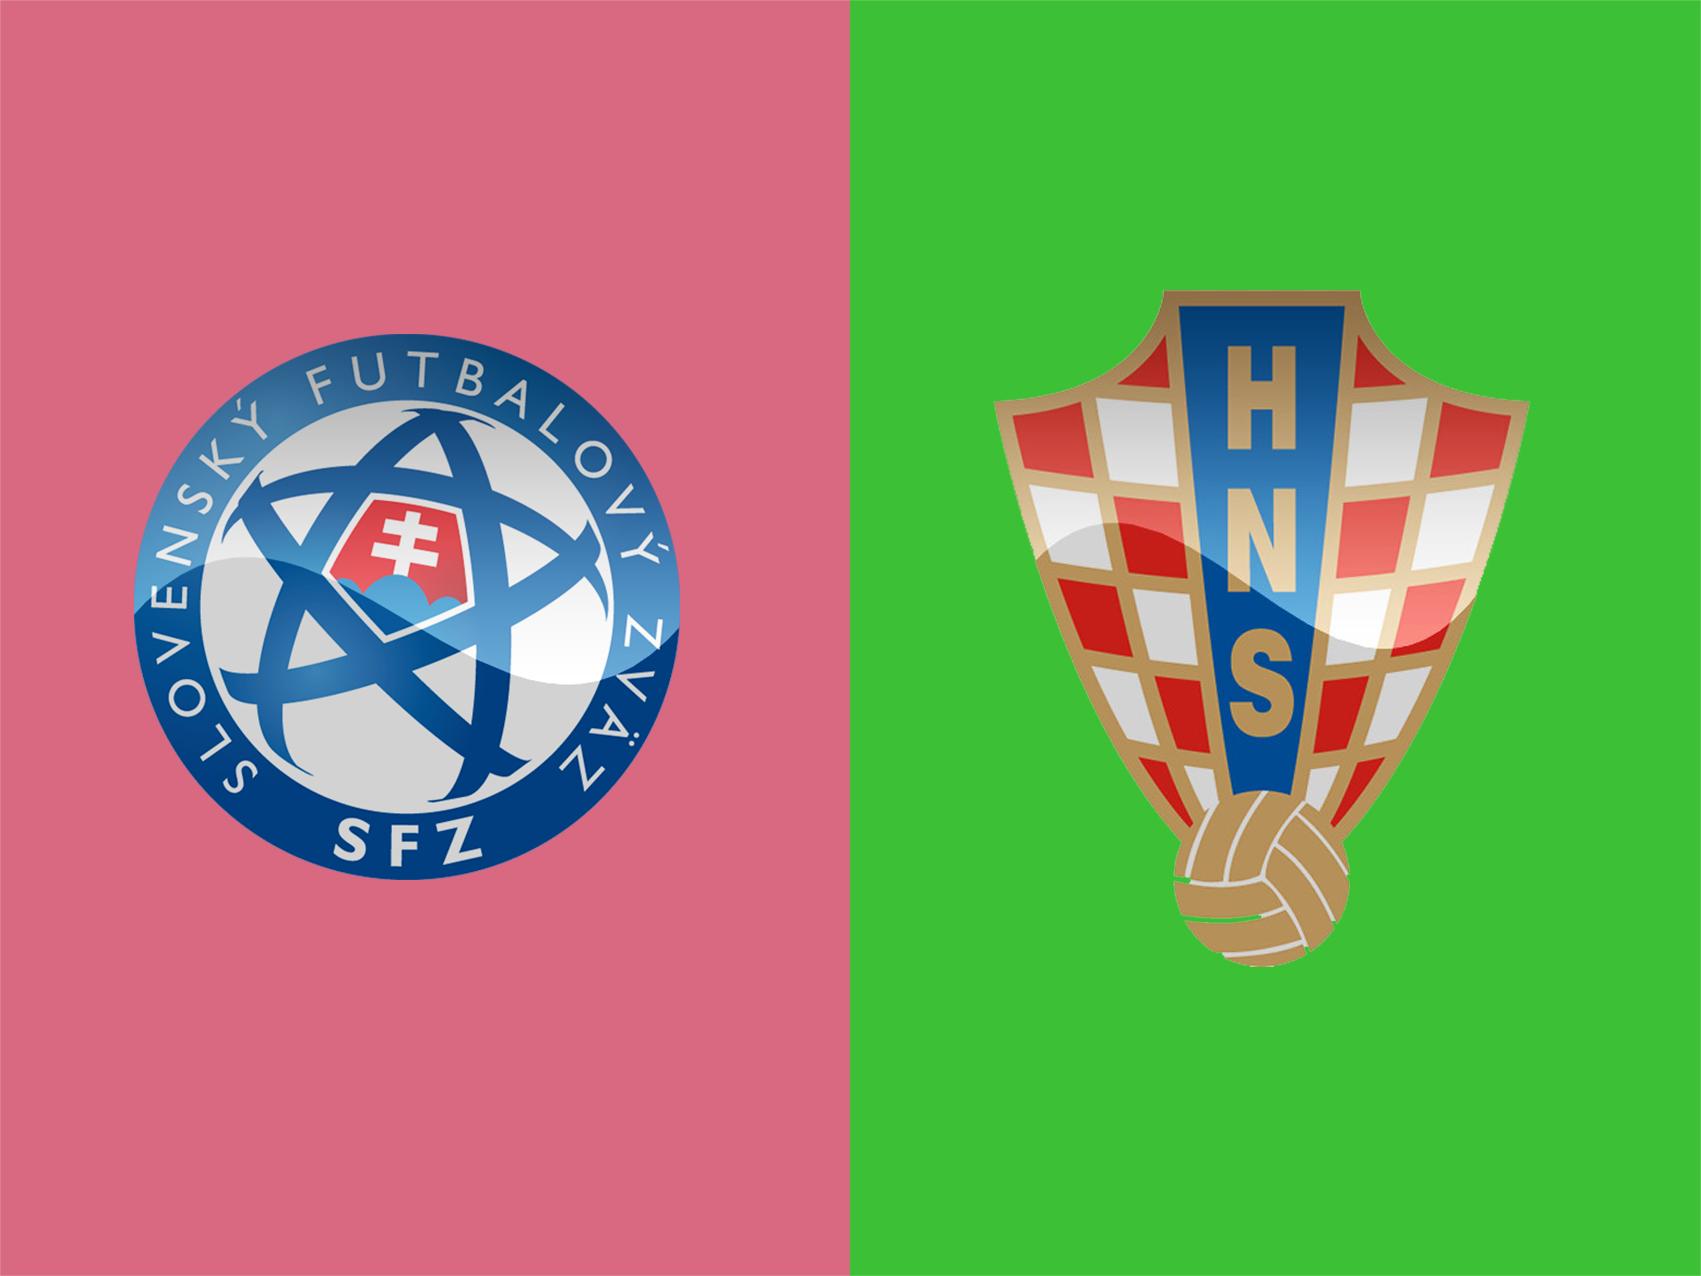 slovakia-vs-croatia-soi-keo-vong-loai-cup-chau-au-07-09-dung-do-thu-du-0